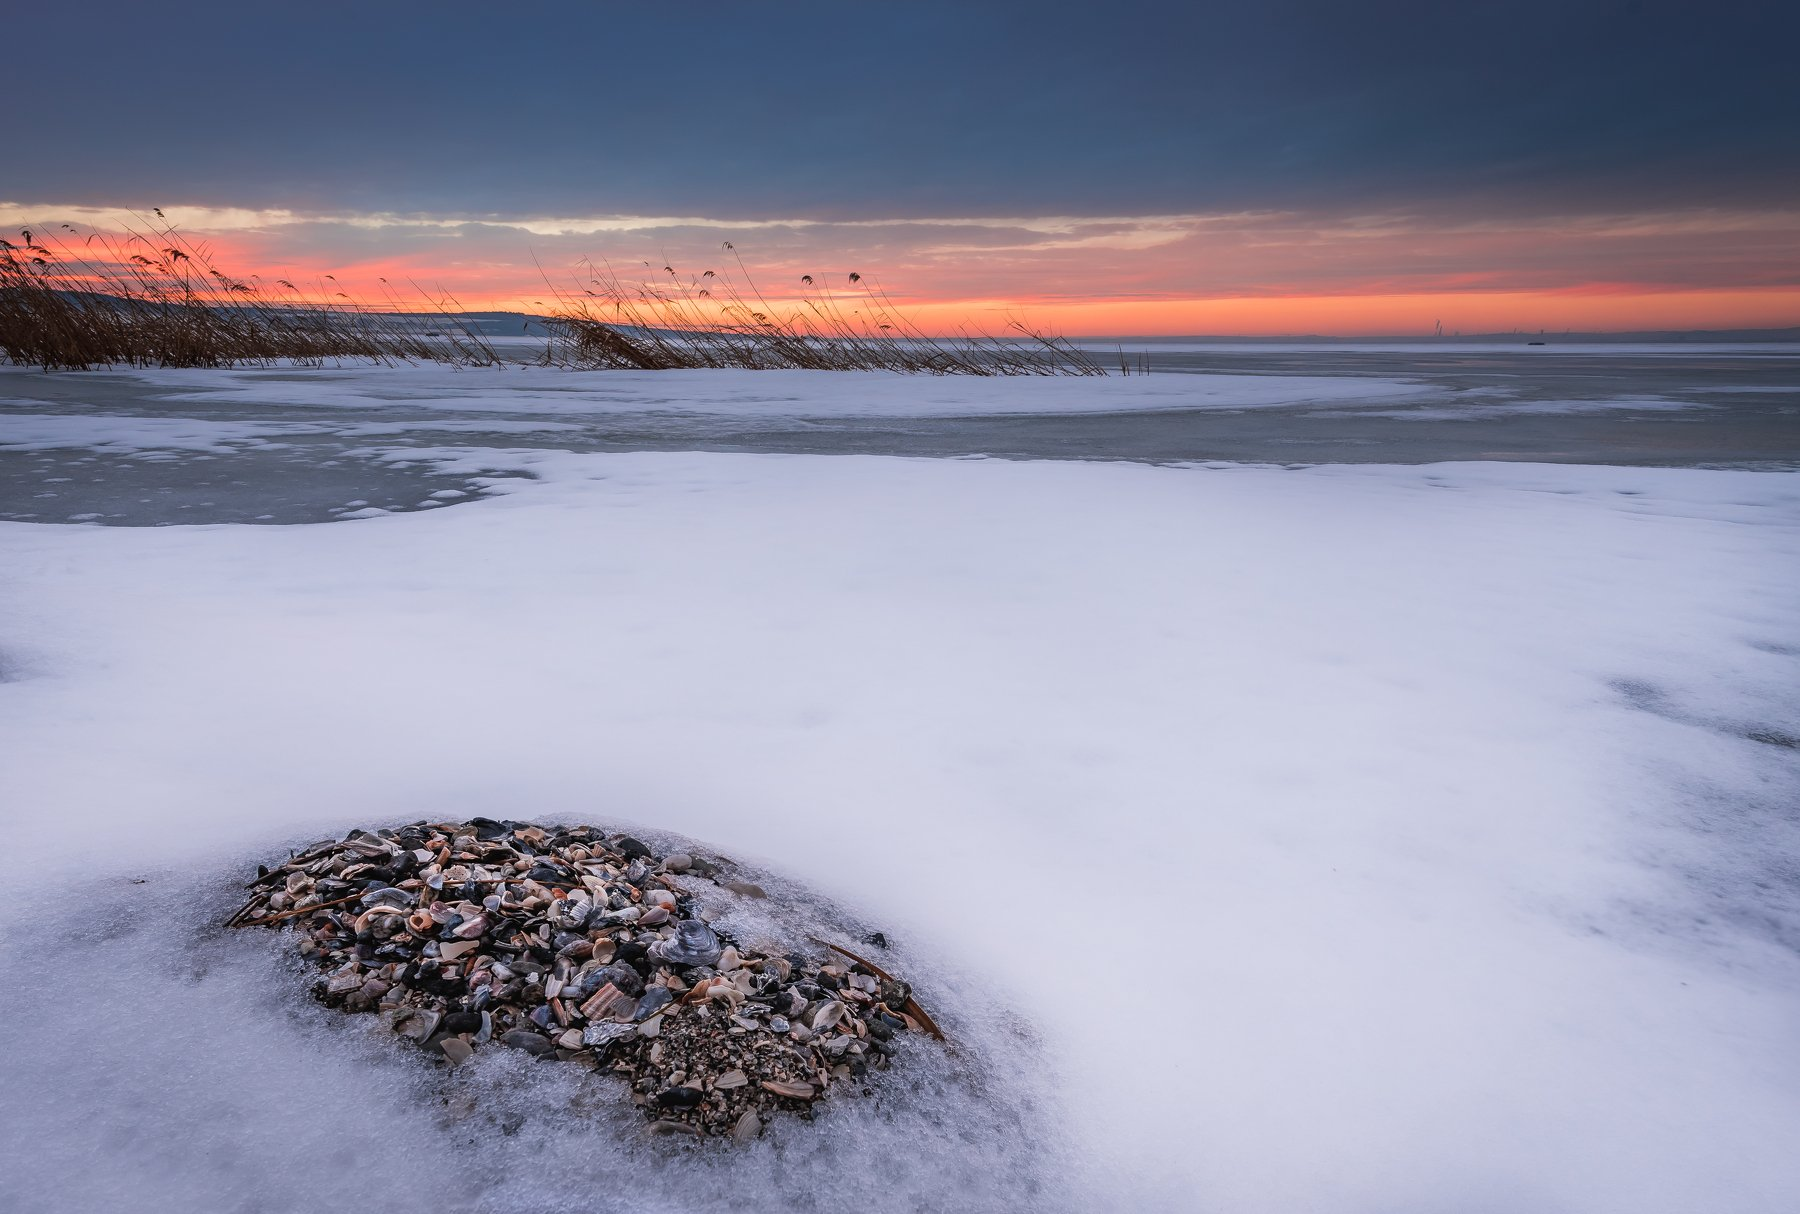 sunset, lake, shell, snow, winter, landscape, nature, Jeni Madjarova